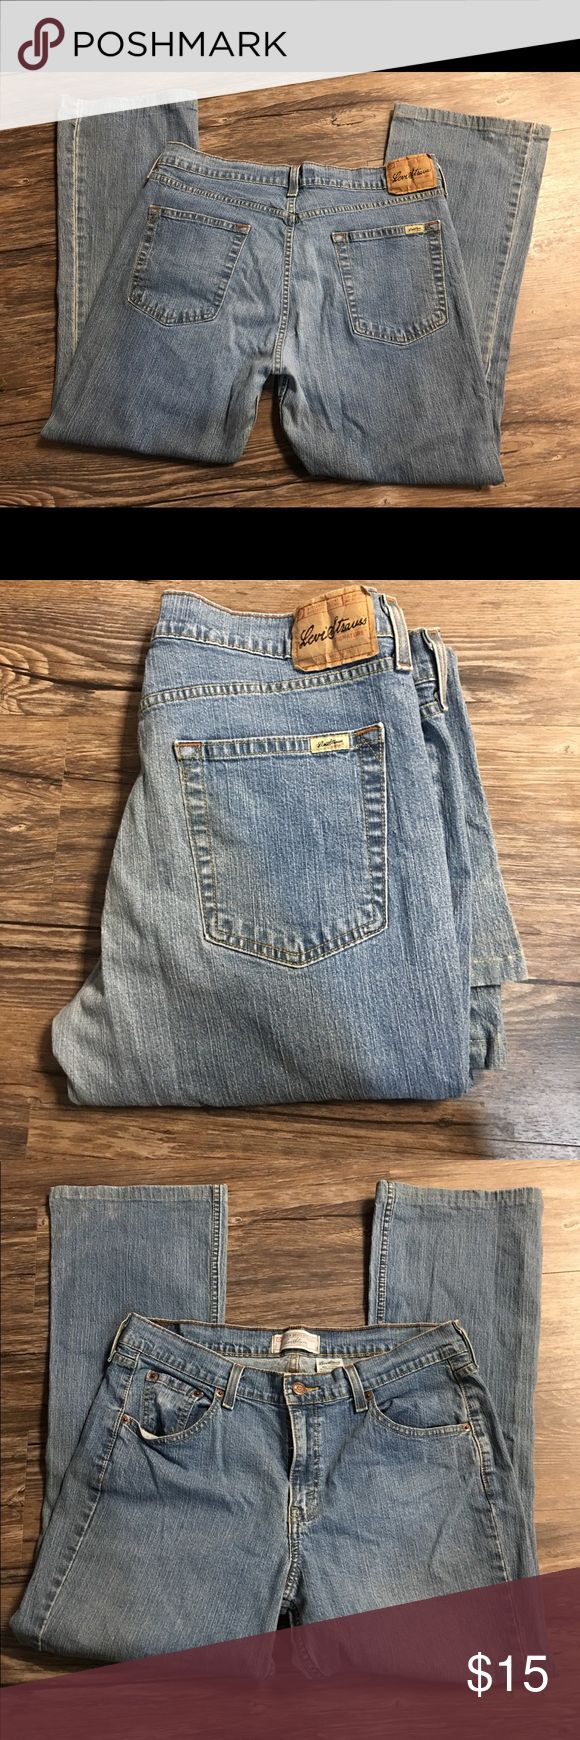 Levi Strauss Boot Cut Jeans Boot Cut Misses Size 14 Medium   99% cotton 1% Lycra Spandex Levi's Jeans Boot Cut